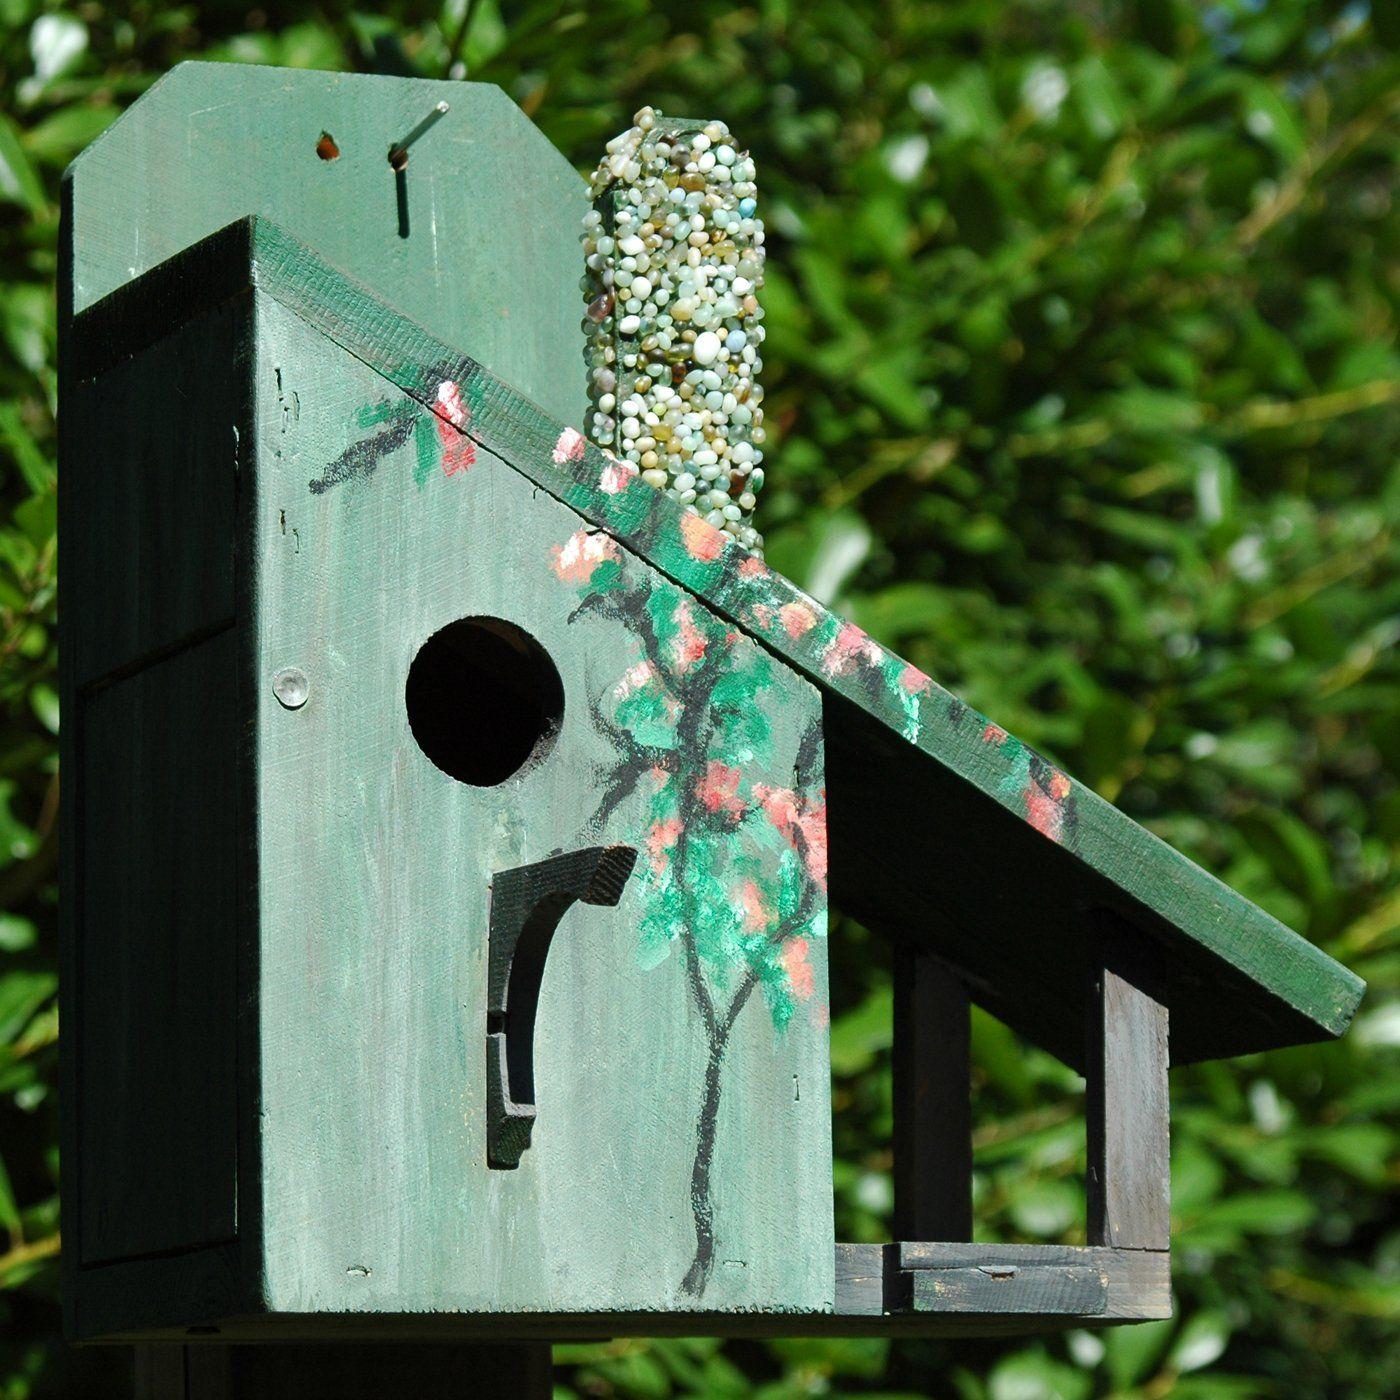 92b912468cd803a4fb8d64ac12e7c111 - Better Homes And Gardens Bird House